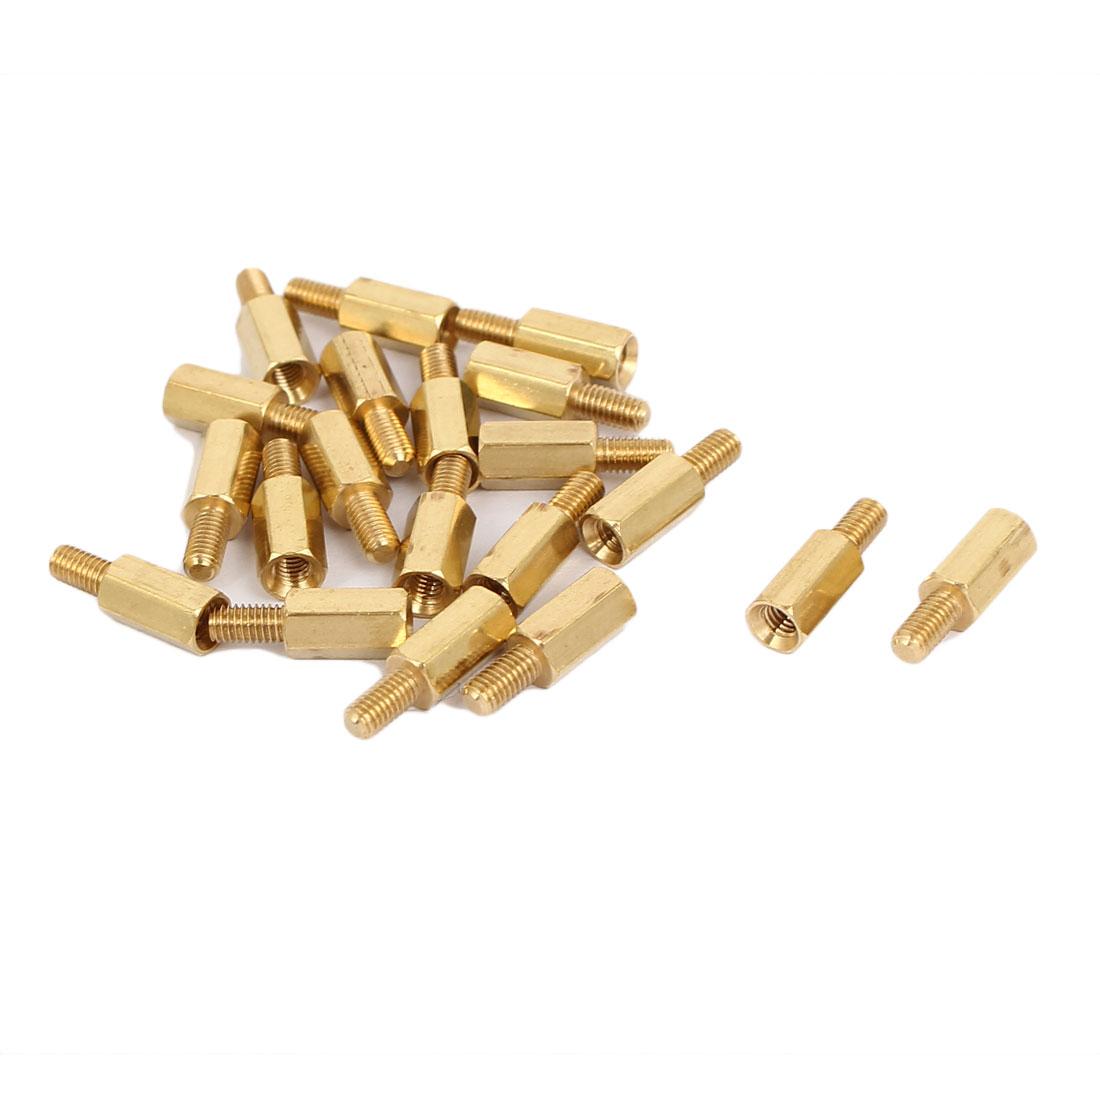 M3x9mm+6mm Male to Female Threaded Brass Hex Hexagonal Standoff Spacer Pillar 20pcs